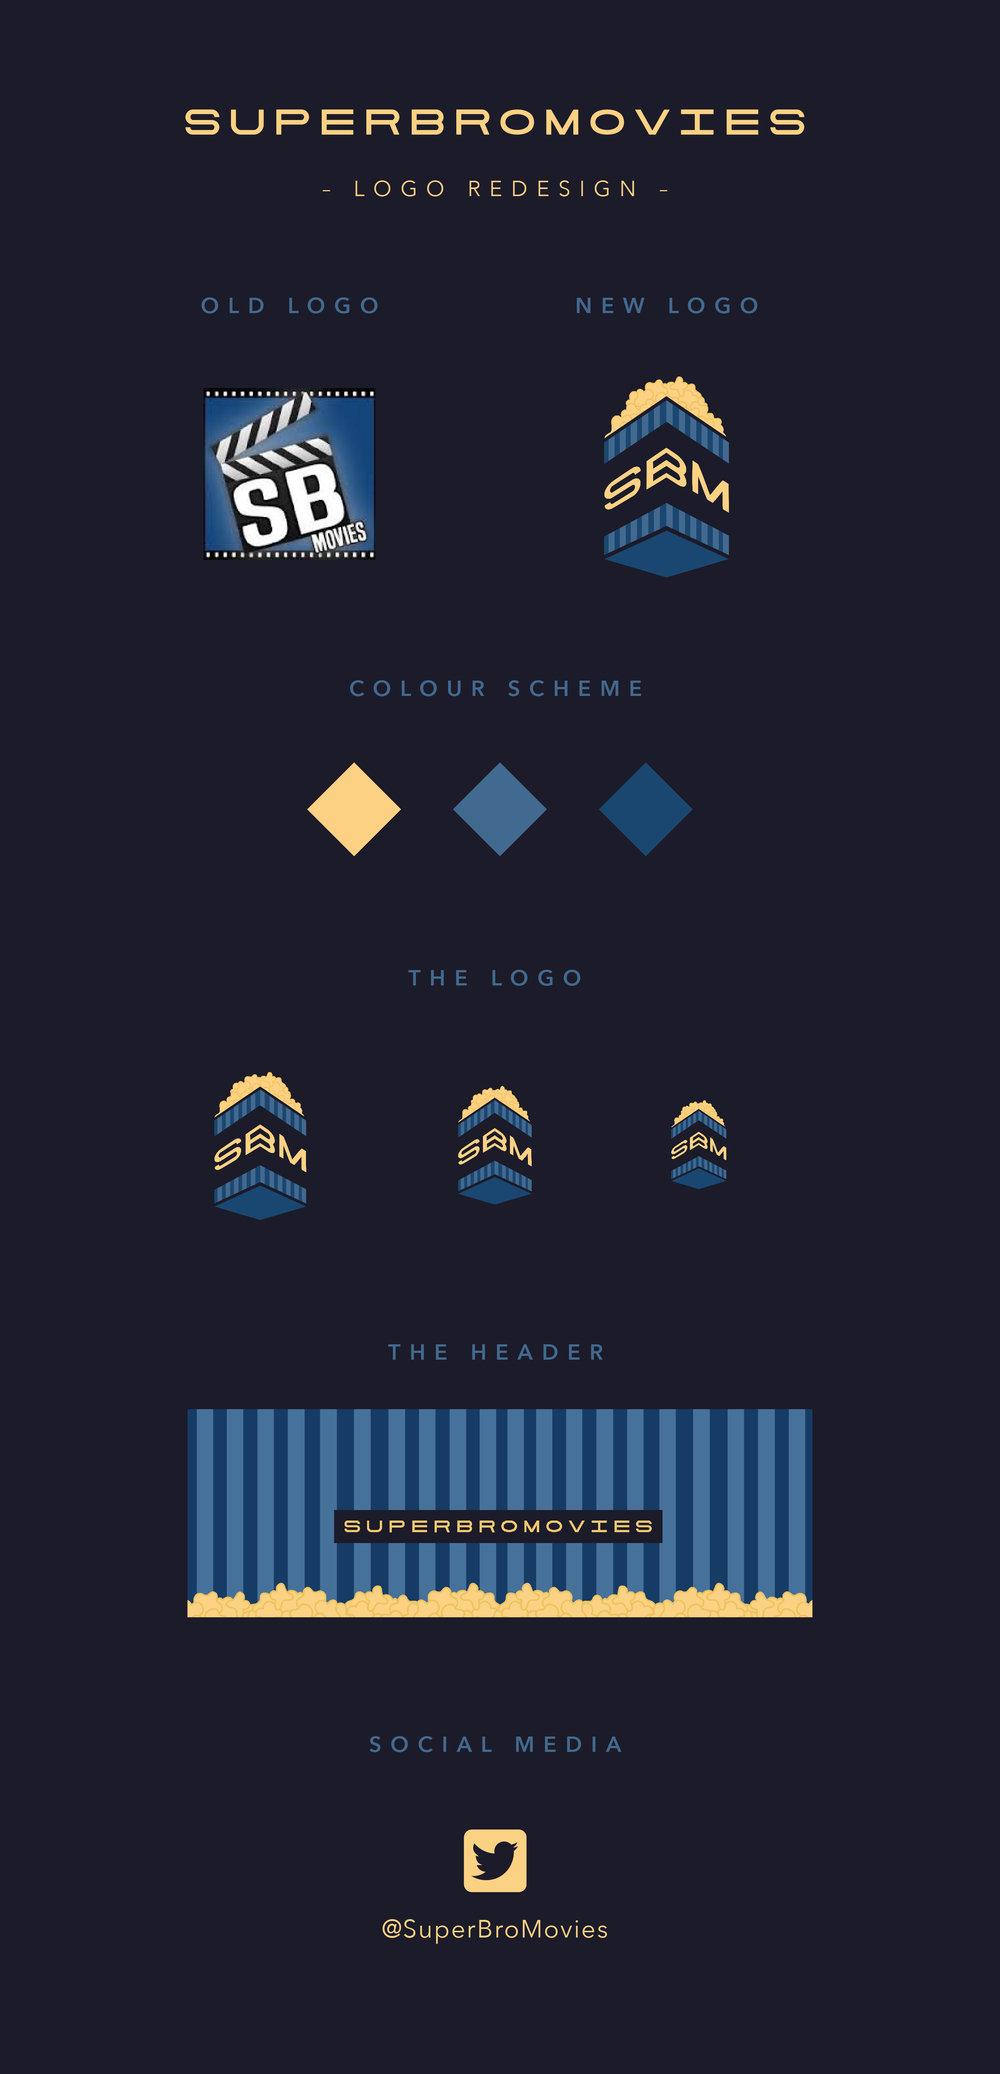 superbromovies_logo_redesign